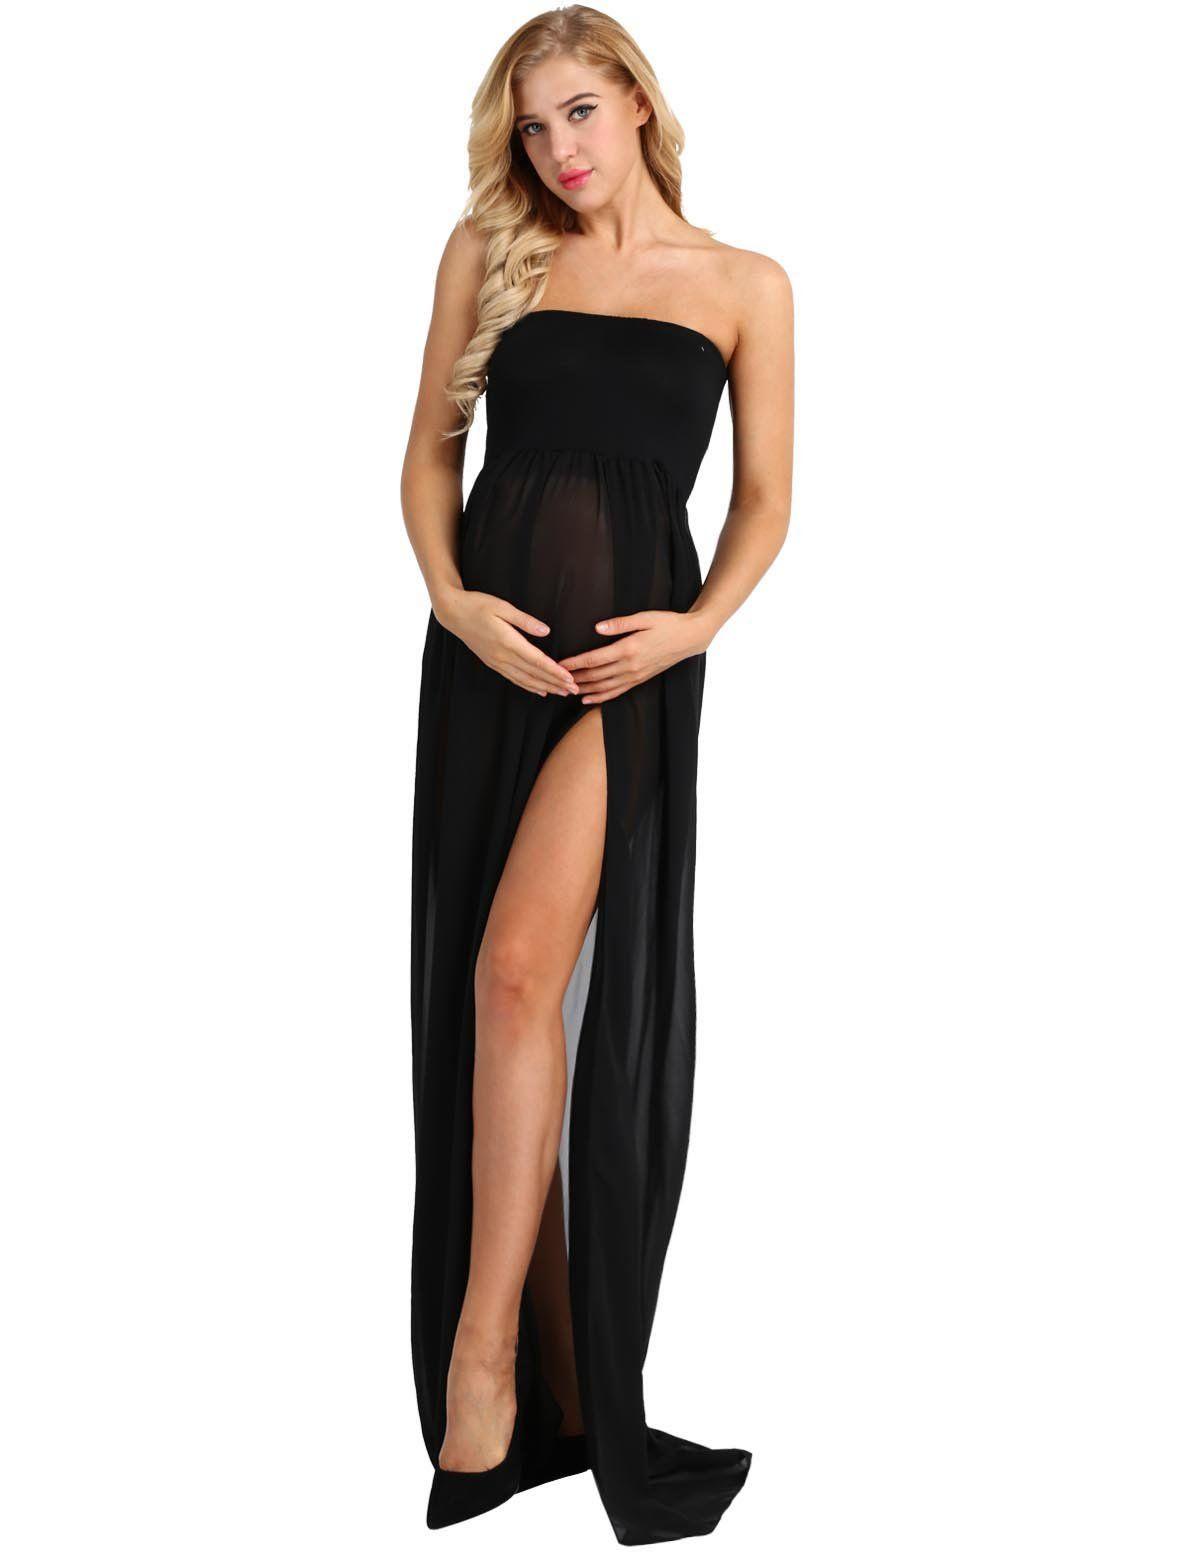 6dec5e152c7 Women Maternity Clothes - iEFiEL Maternity Women Chiffon Gown Split Front  Strapless Maxi Pregnancy Photography Dresses Black XL     Find out even  more ...